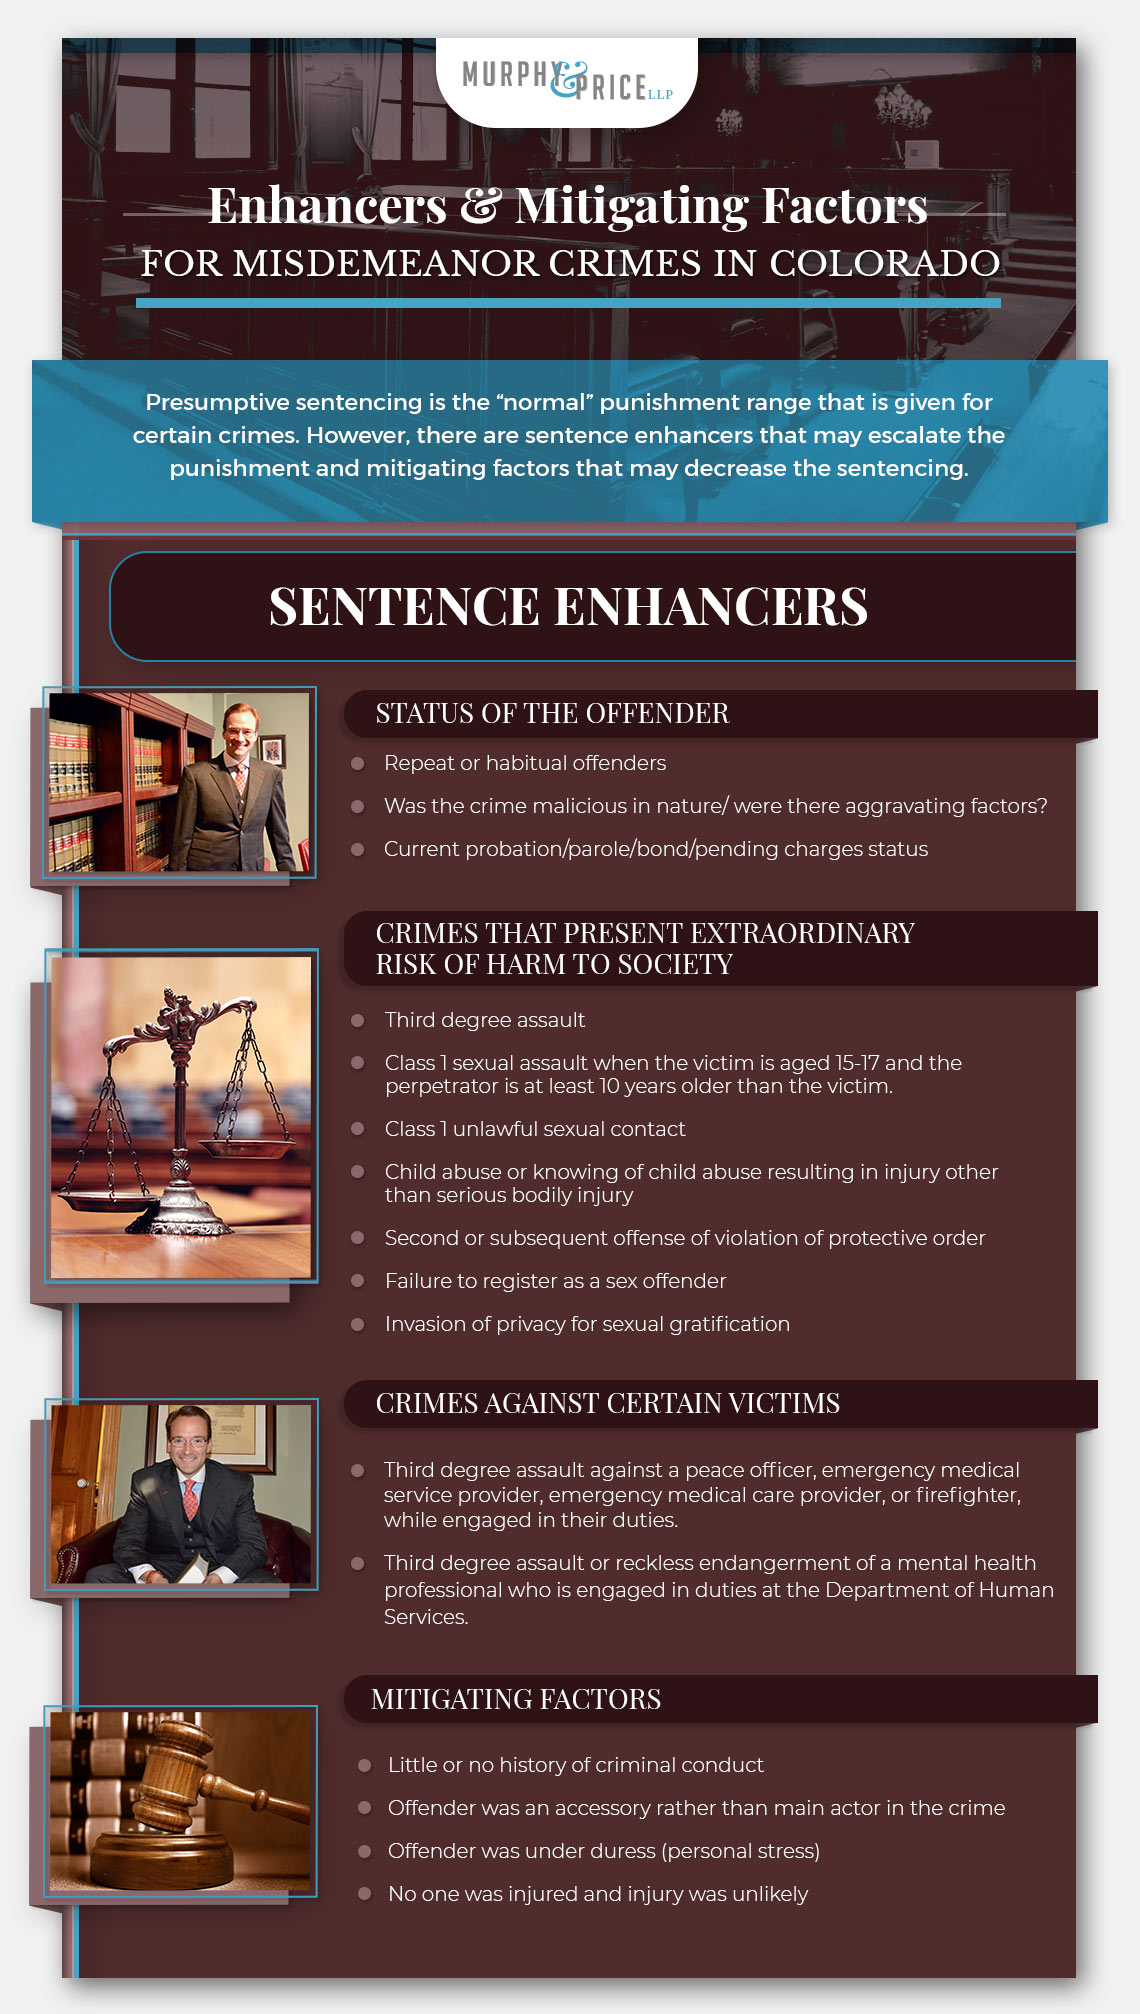 class 2 misdemeanor fines in colorado